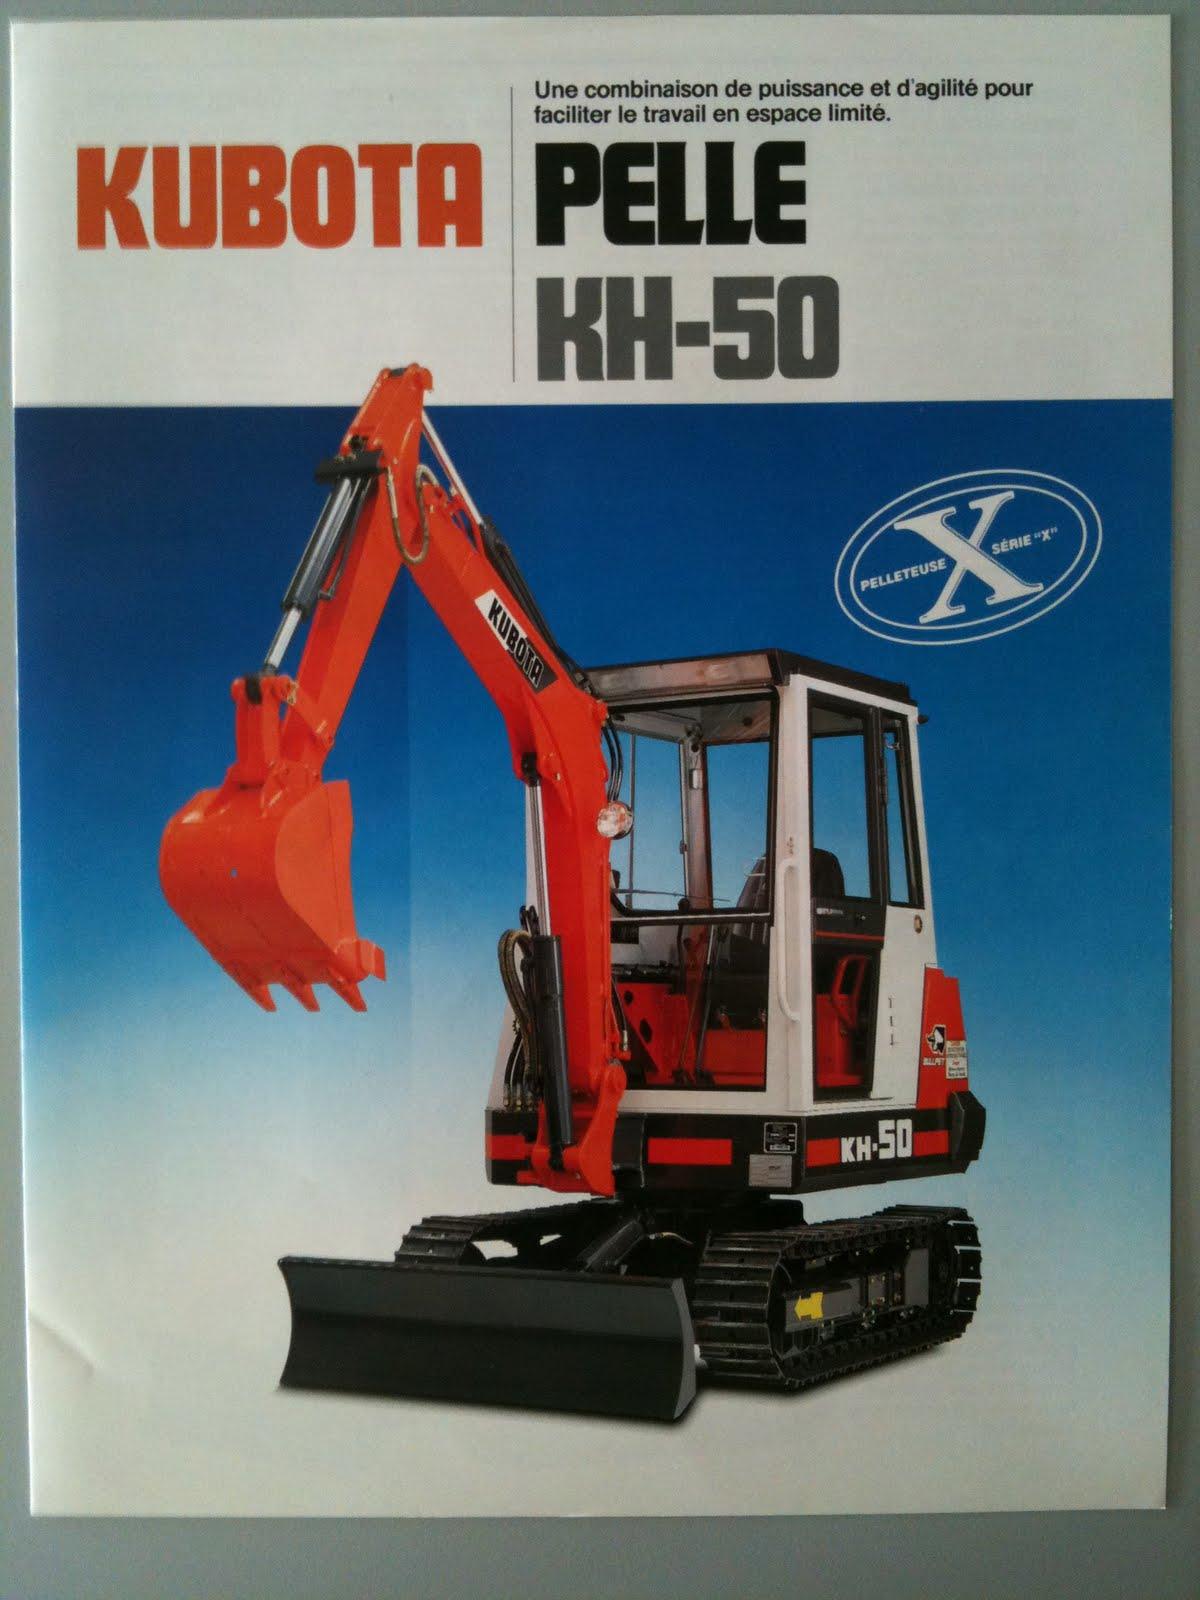 earthmoving machinery sales brochures kubota track excavator kh 50 367 rh mmtcat blogspot com Kubota L3940 Schematic Kubota L3940 Schematic